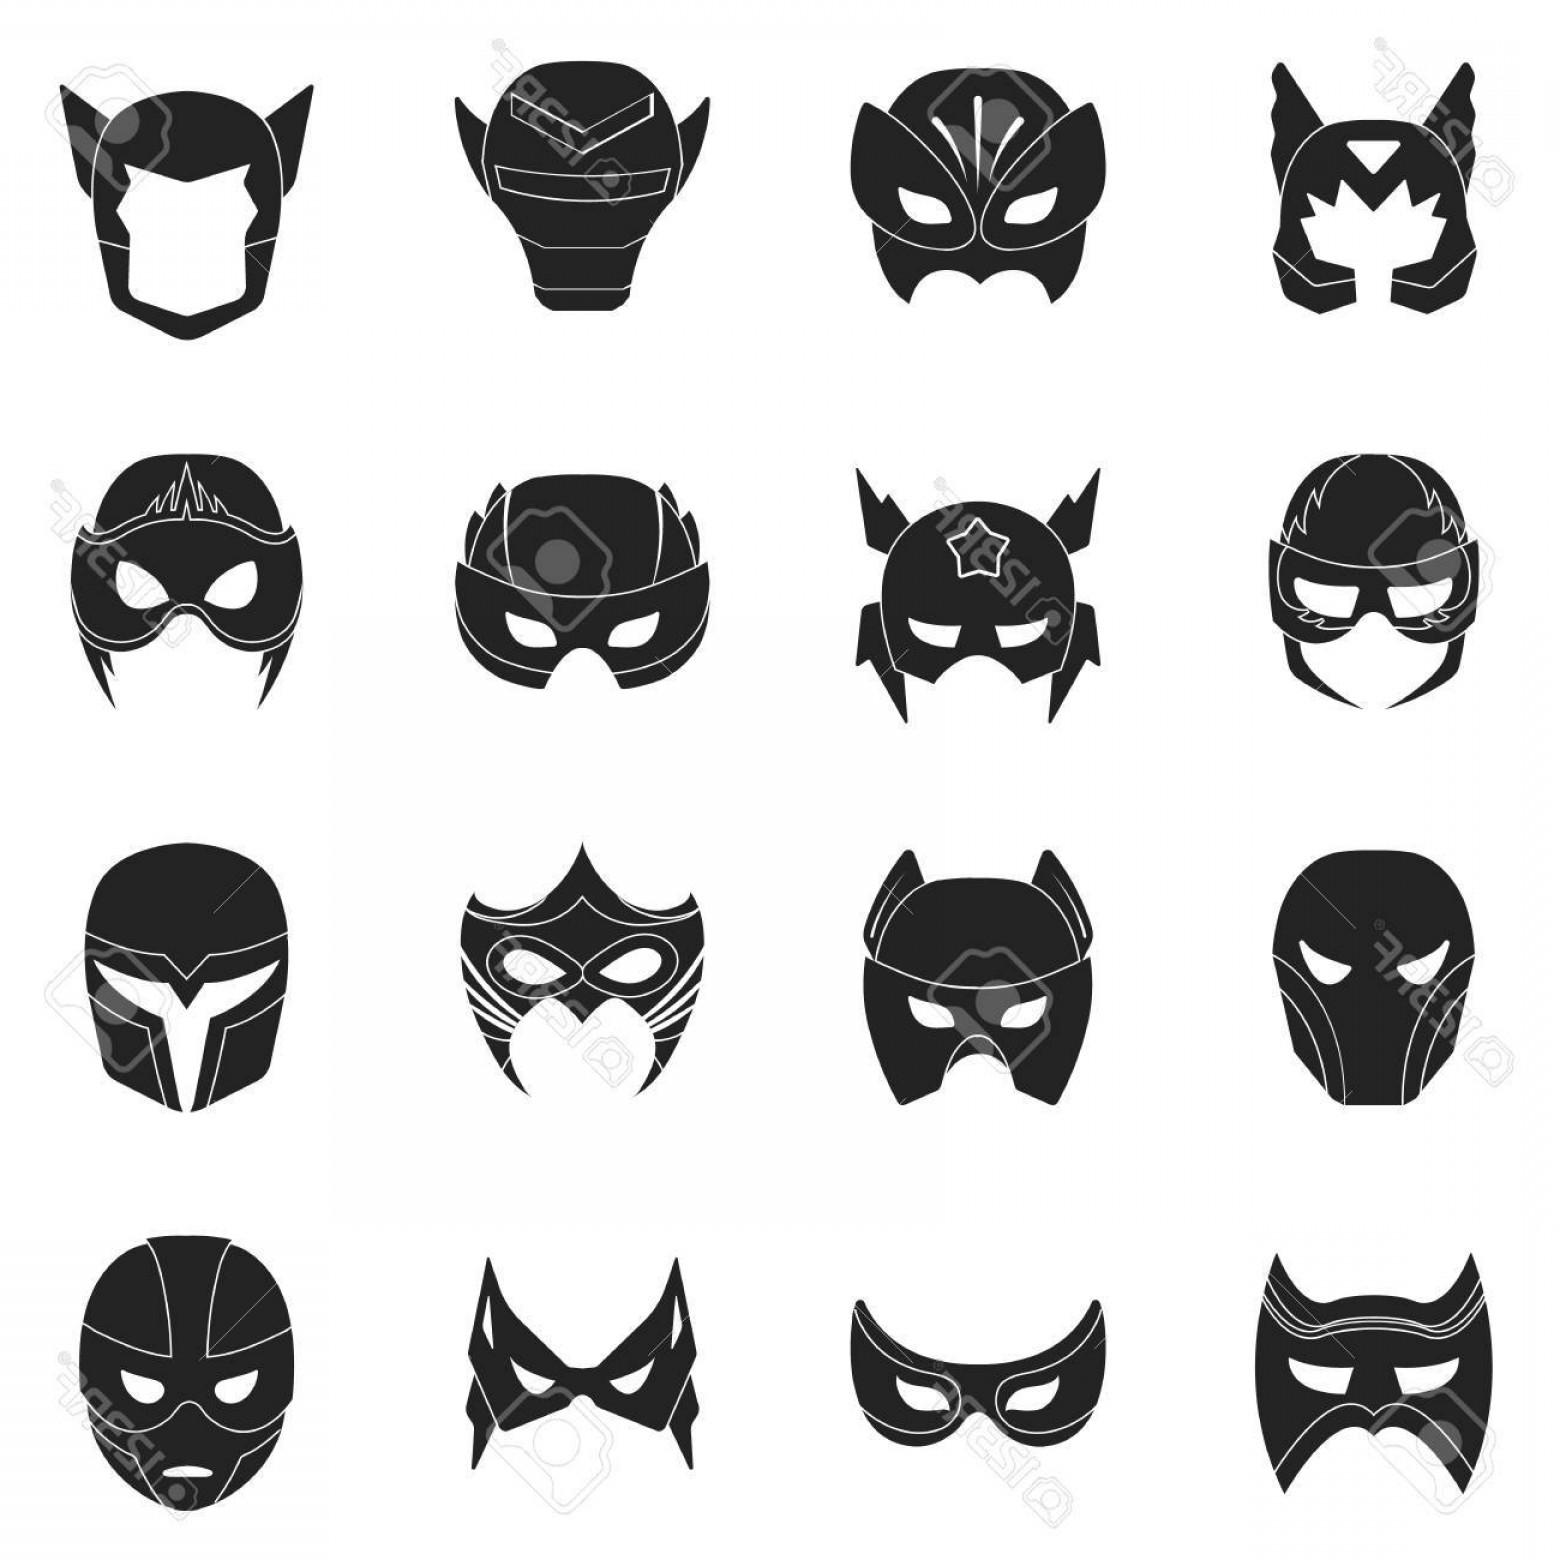 1560x1560 Photostock Vector Superhero Mask Set Icons In Black Style Big